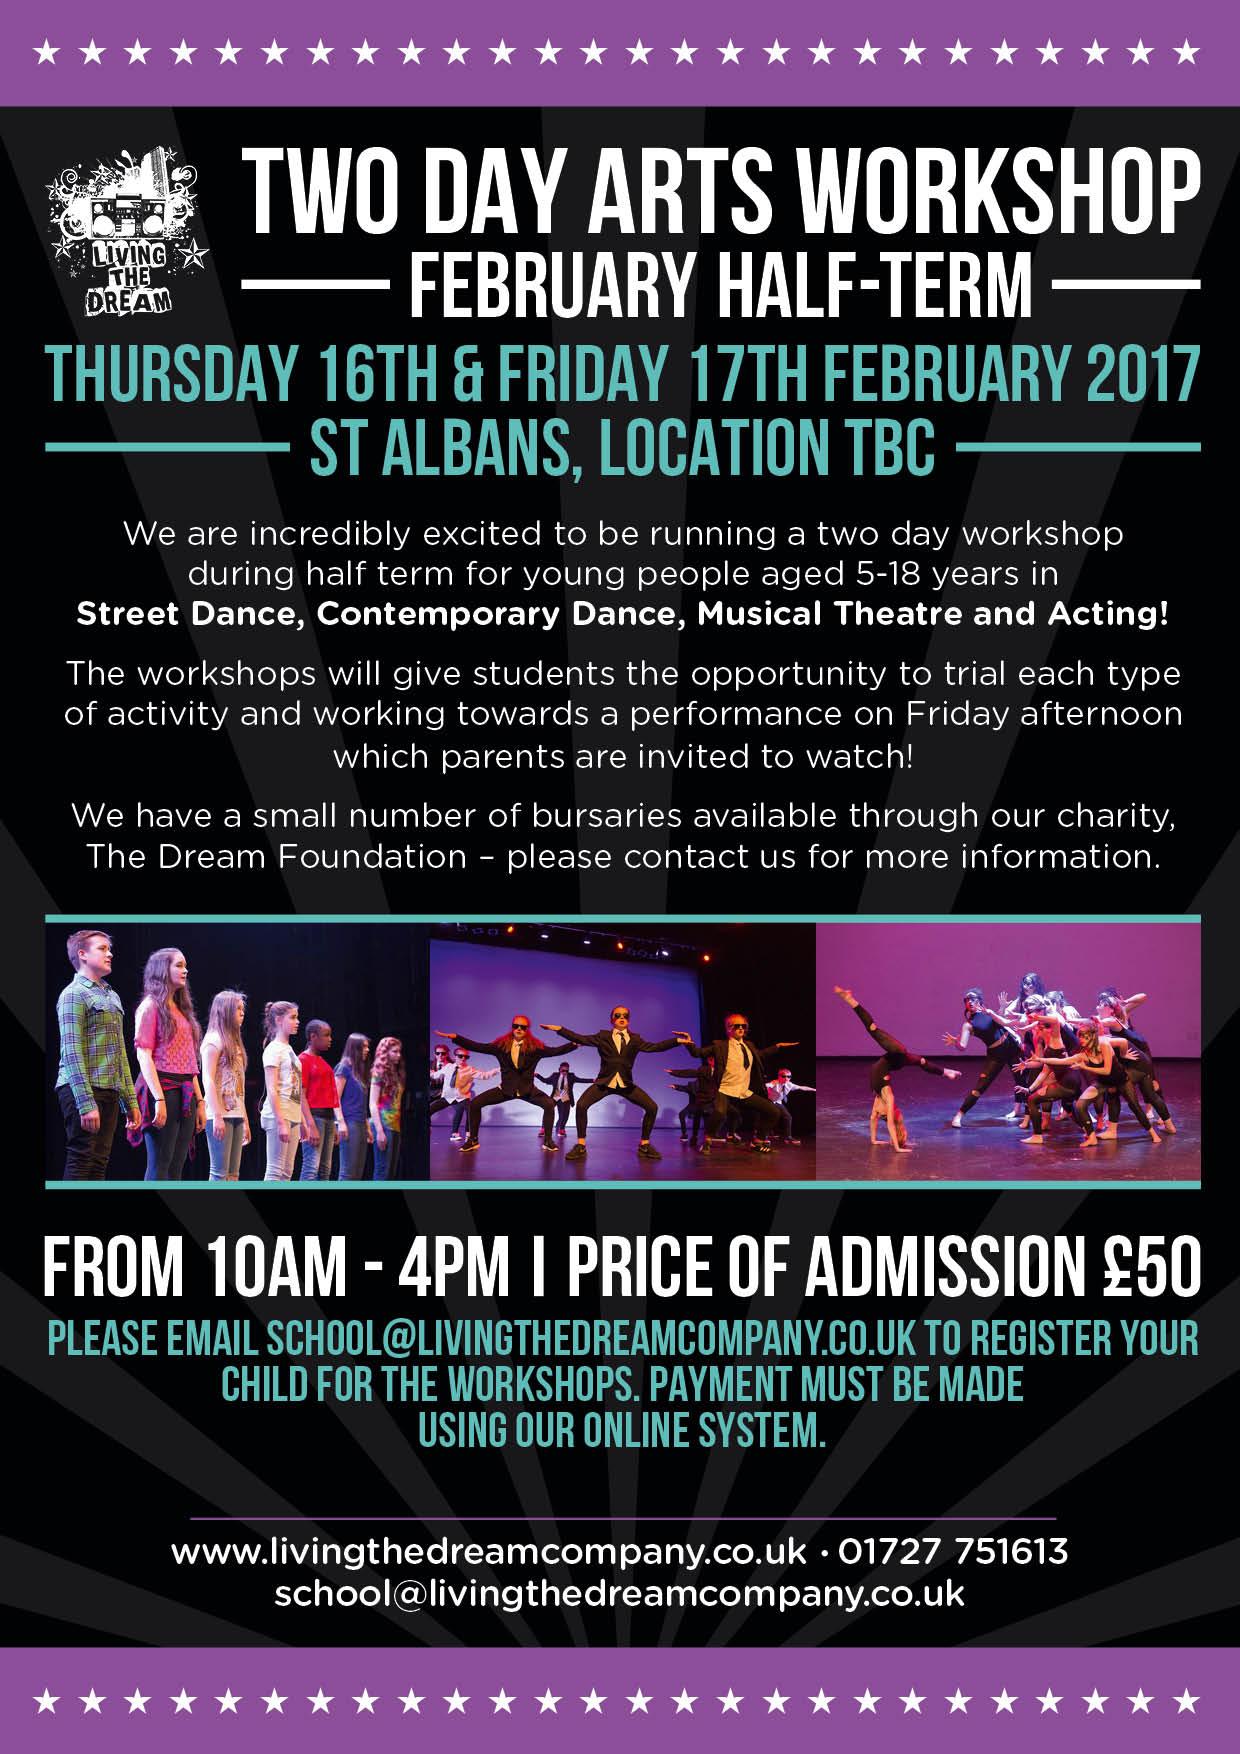 February 2017 Free Arts Workshops Flyer_Fourth_Draft